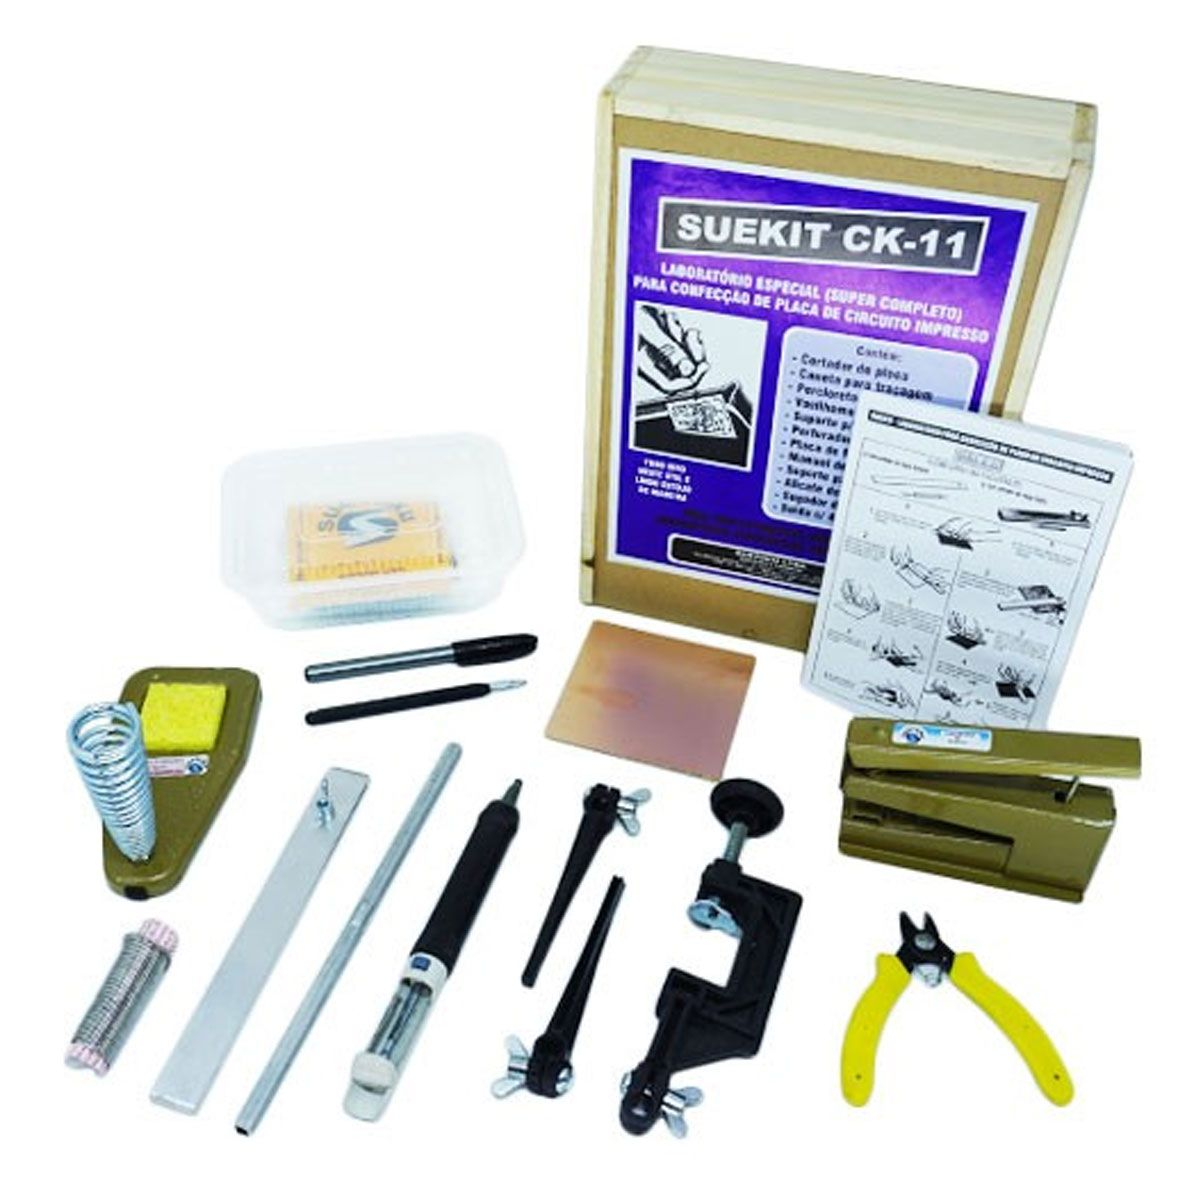 Kit Suetoku para Circuito Impresso de Eletrônica Suekit CK-11